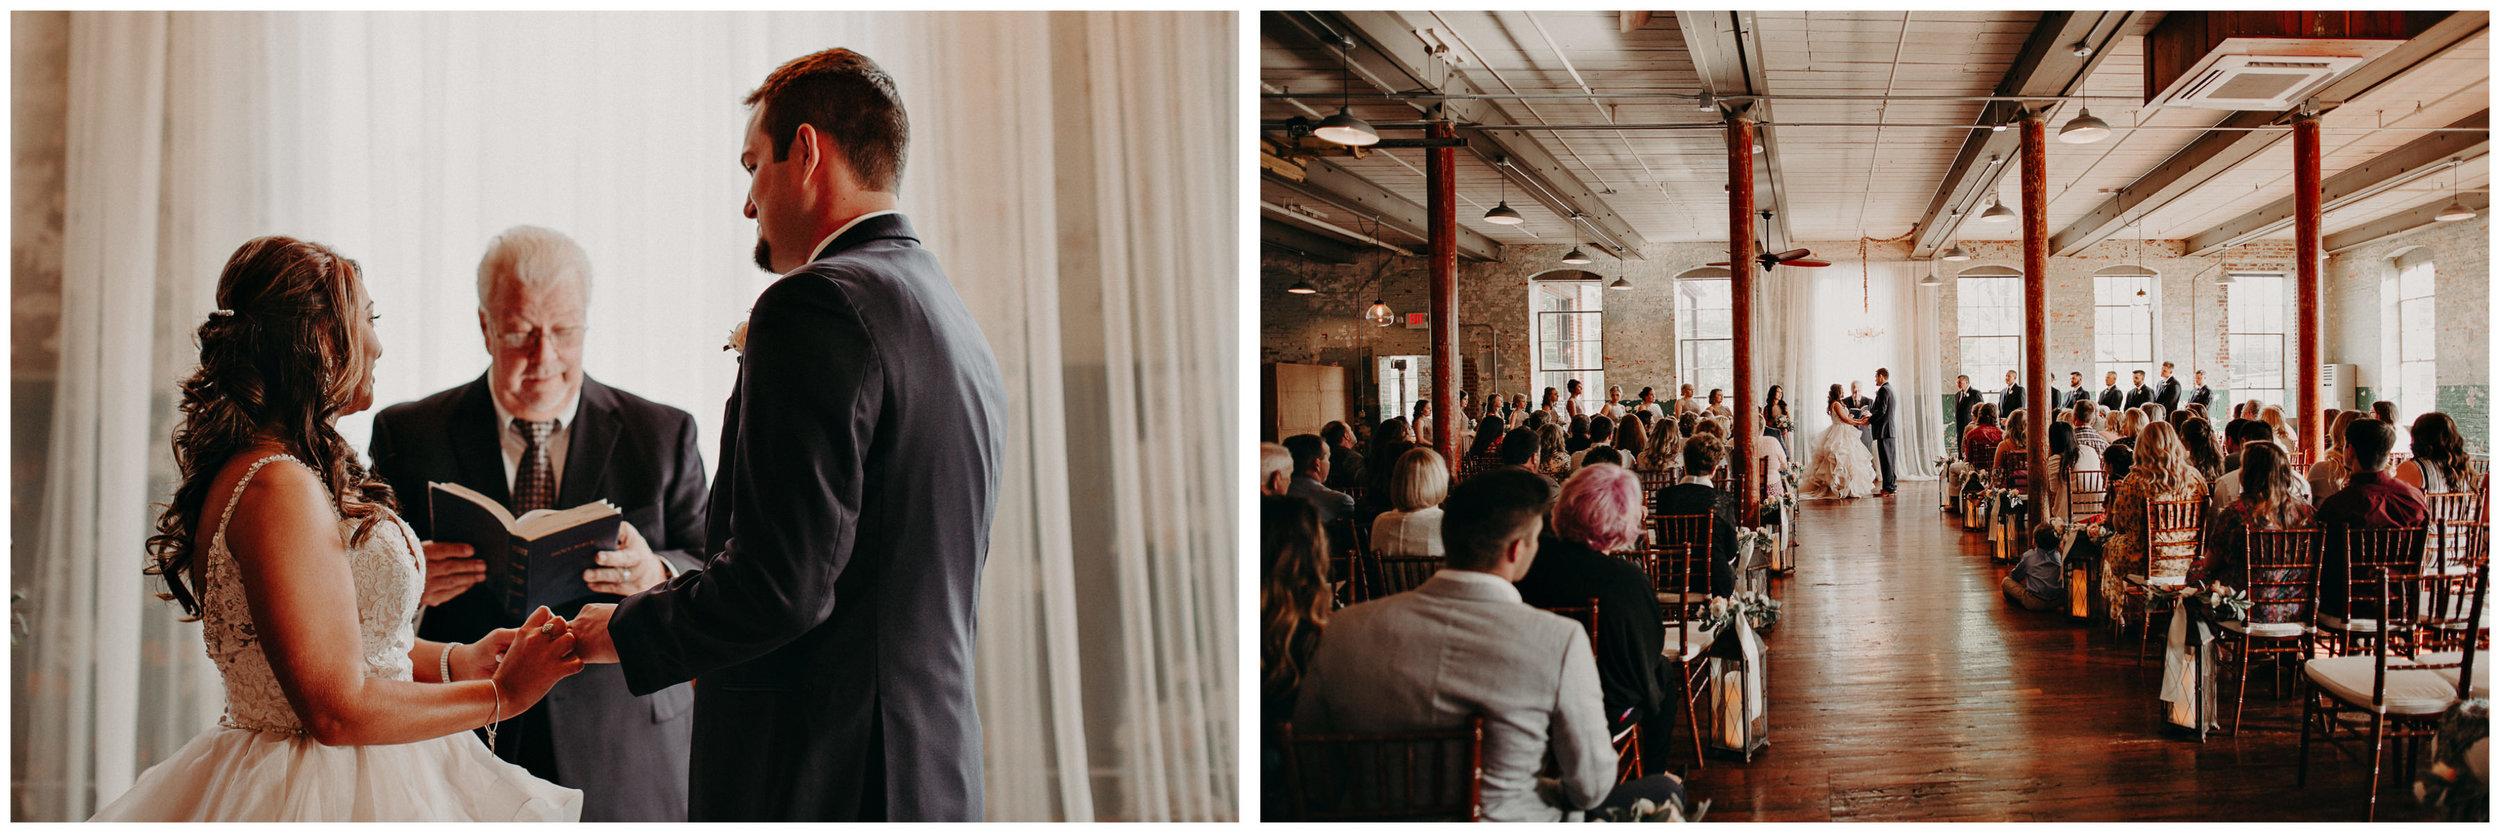 42 4 - Atlanta Wedding Photographer - The engine room - Ga - Wedding trends - Aline Marin Photography.jpg